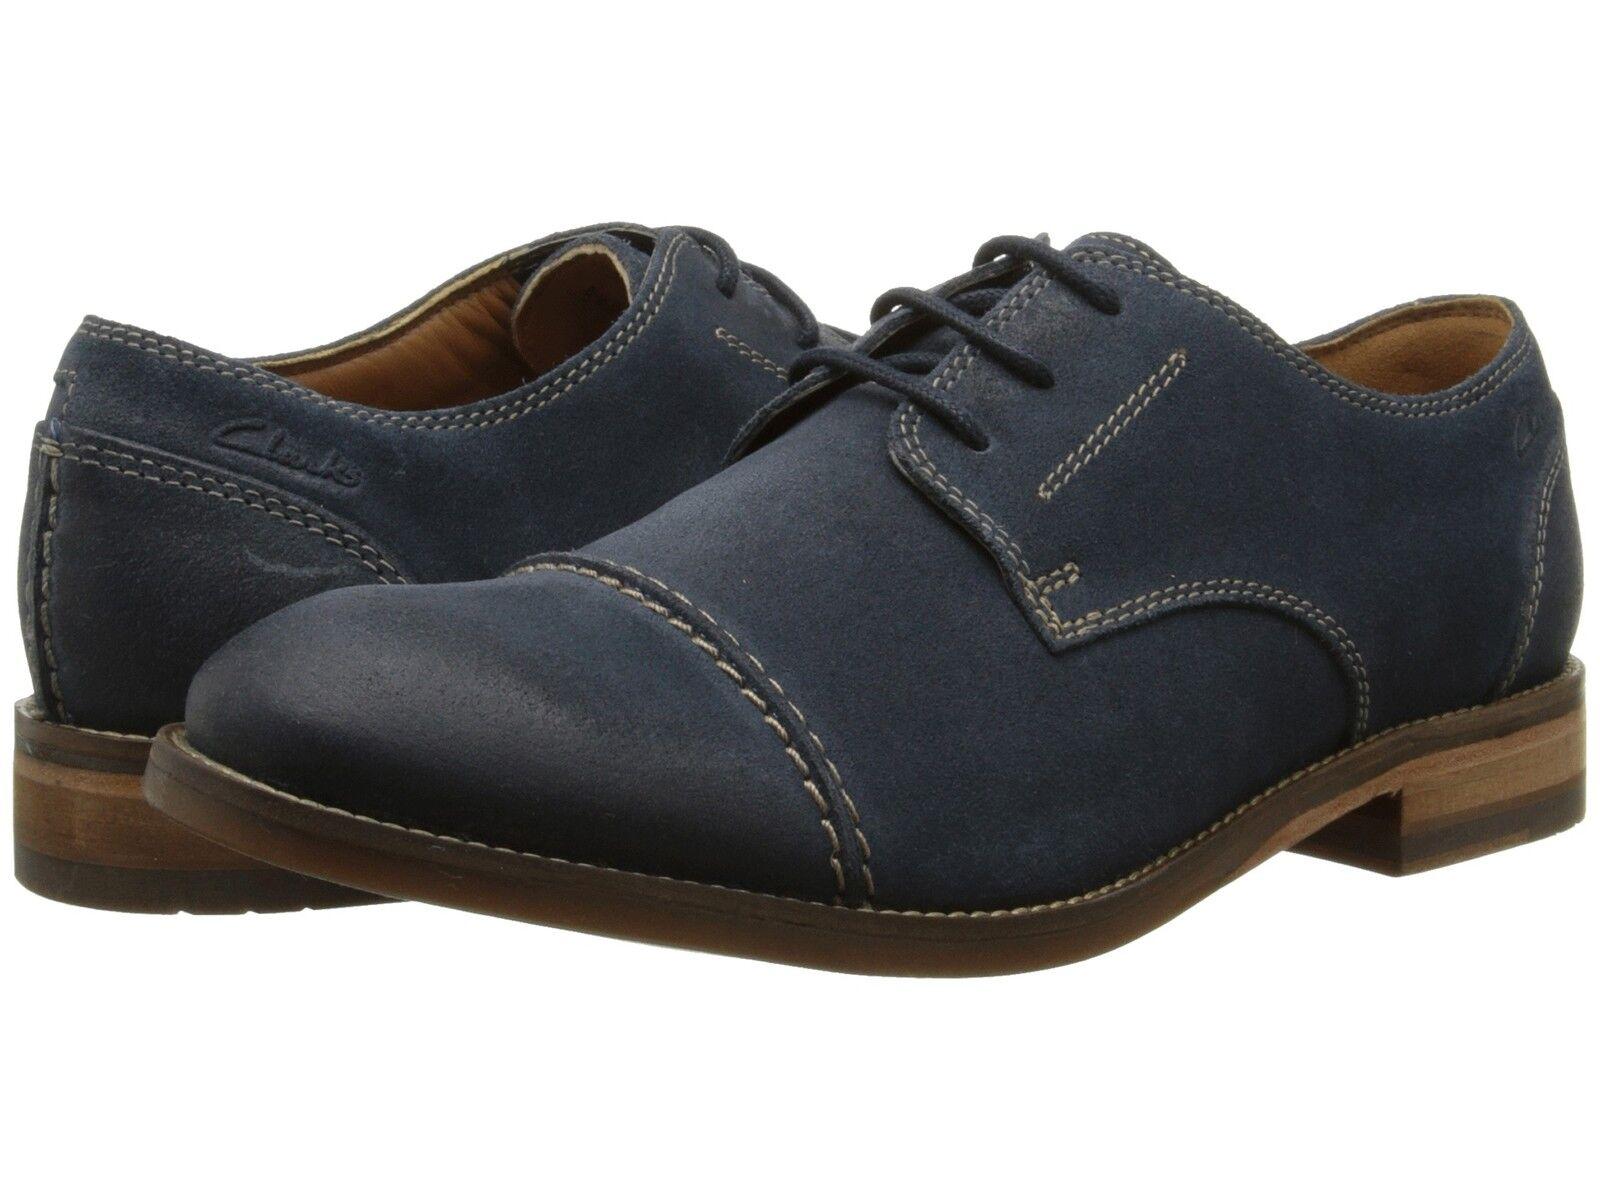 Men's Clarks 1825 Collection Exton Cap LaceUp shoes bluee Navy Suede 26107734